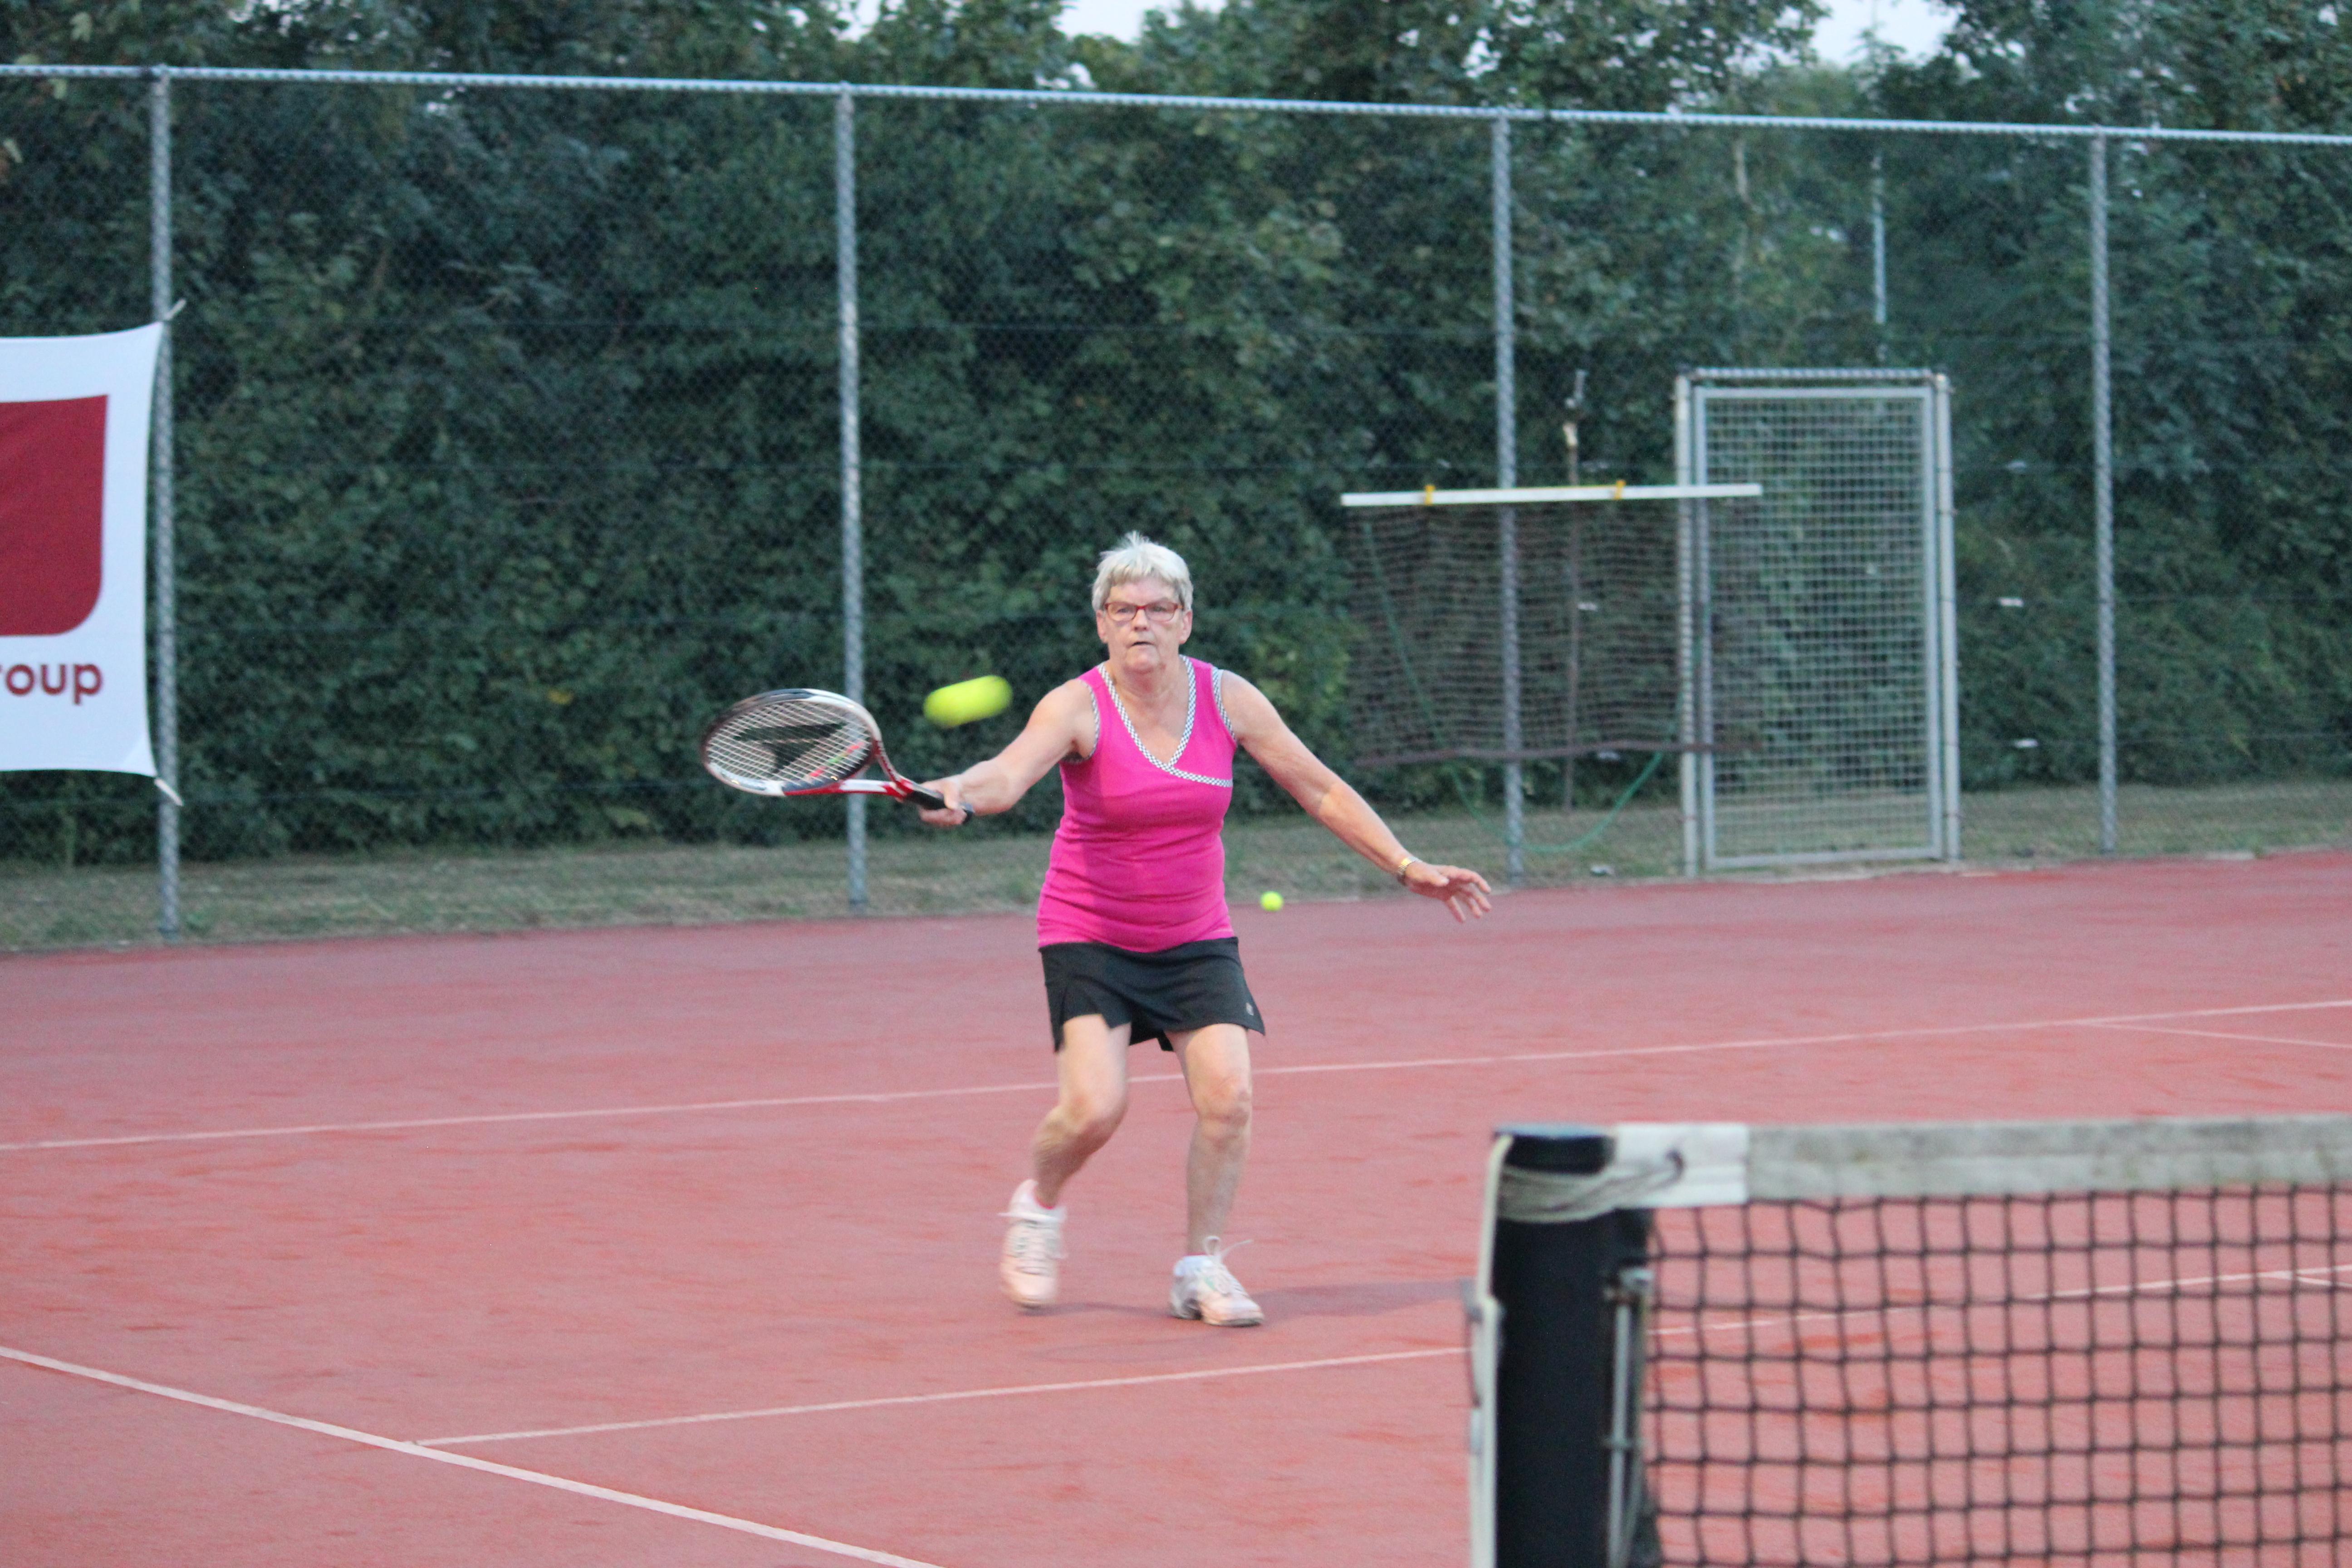 ATM Open Tennis Toernooi 2016